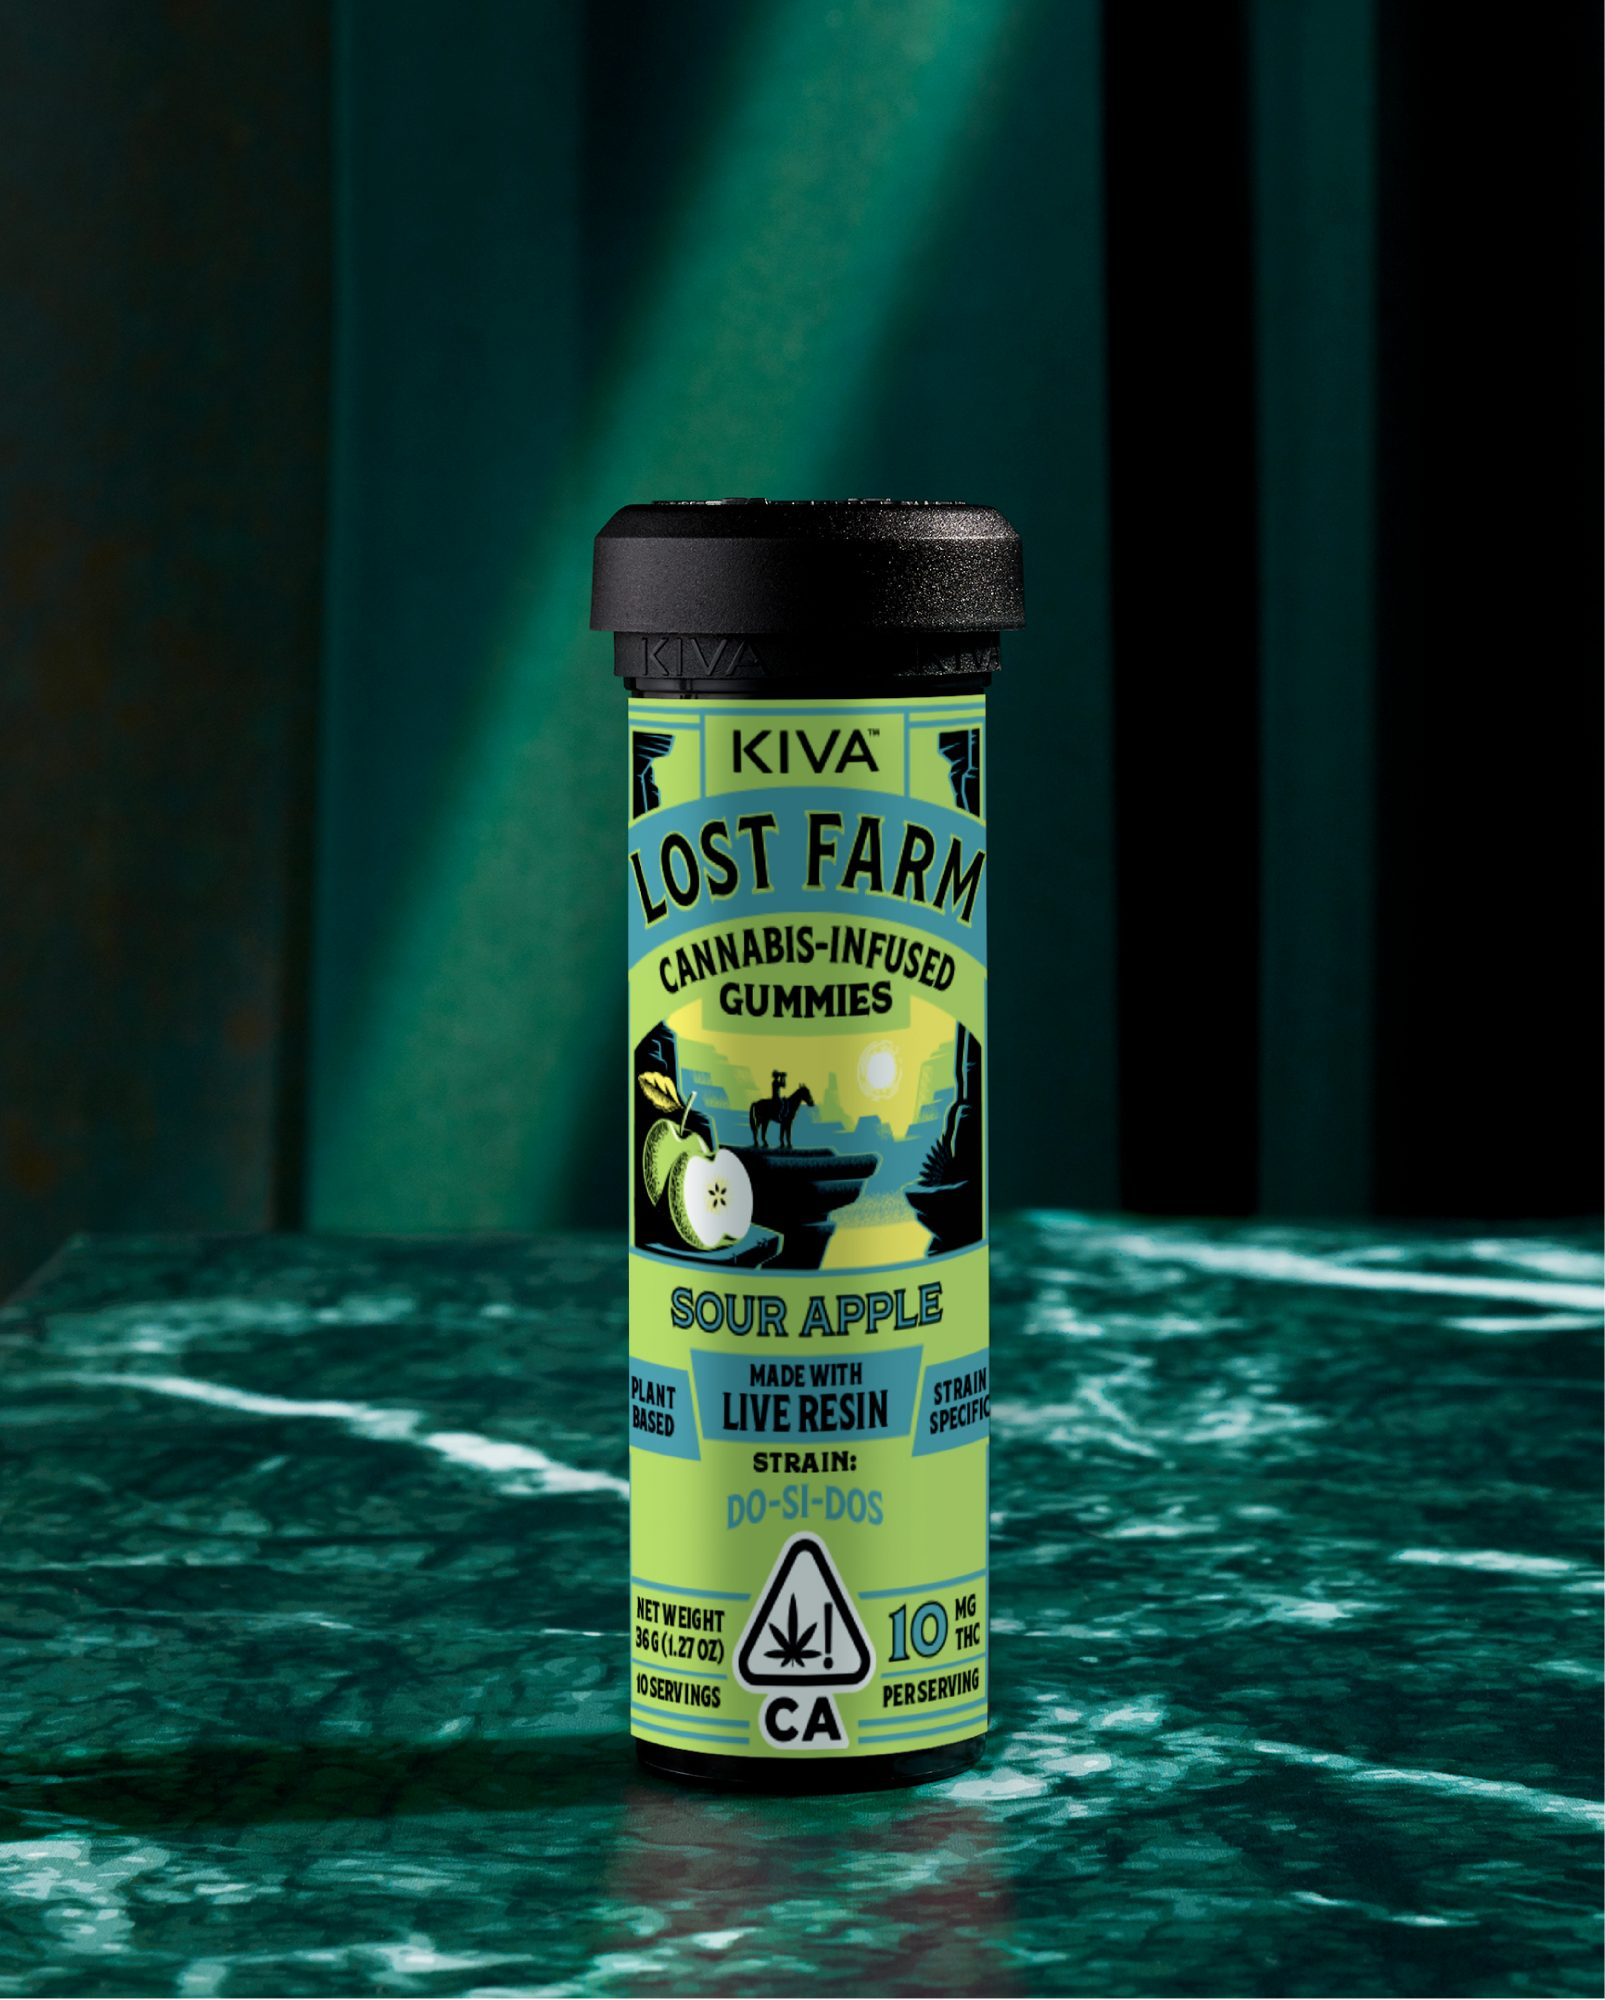 Kiva Website Lost Farm Sour Apple Template Primary Image Hero